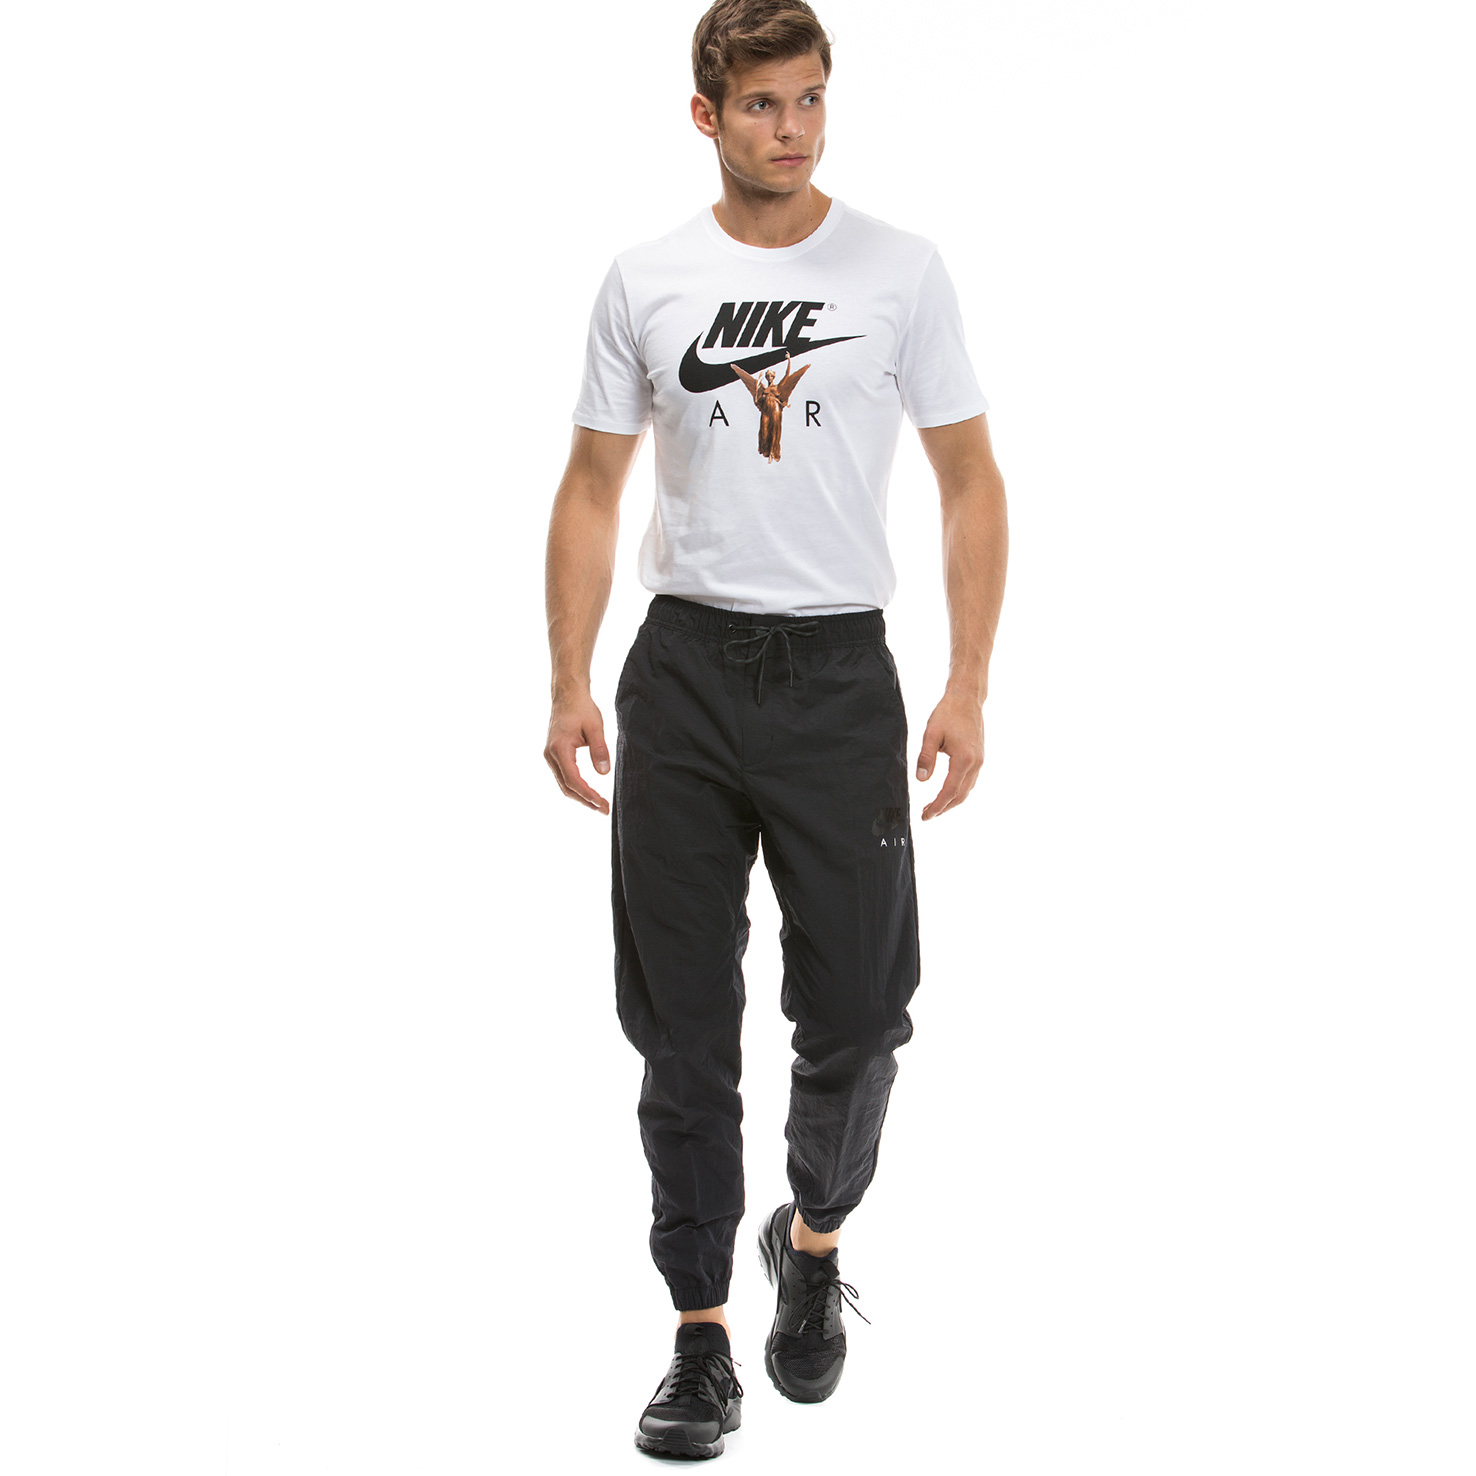 Nike Nsw Pant Air Wvn Erkek Siyah Eşofman Altı